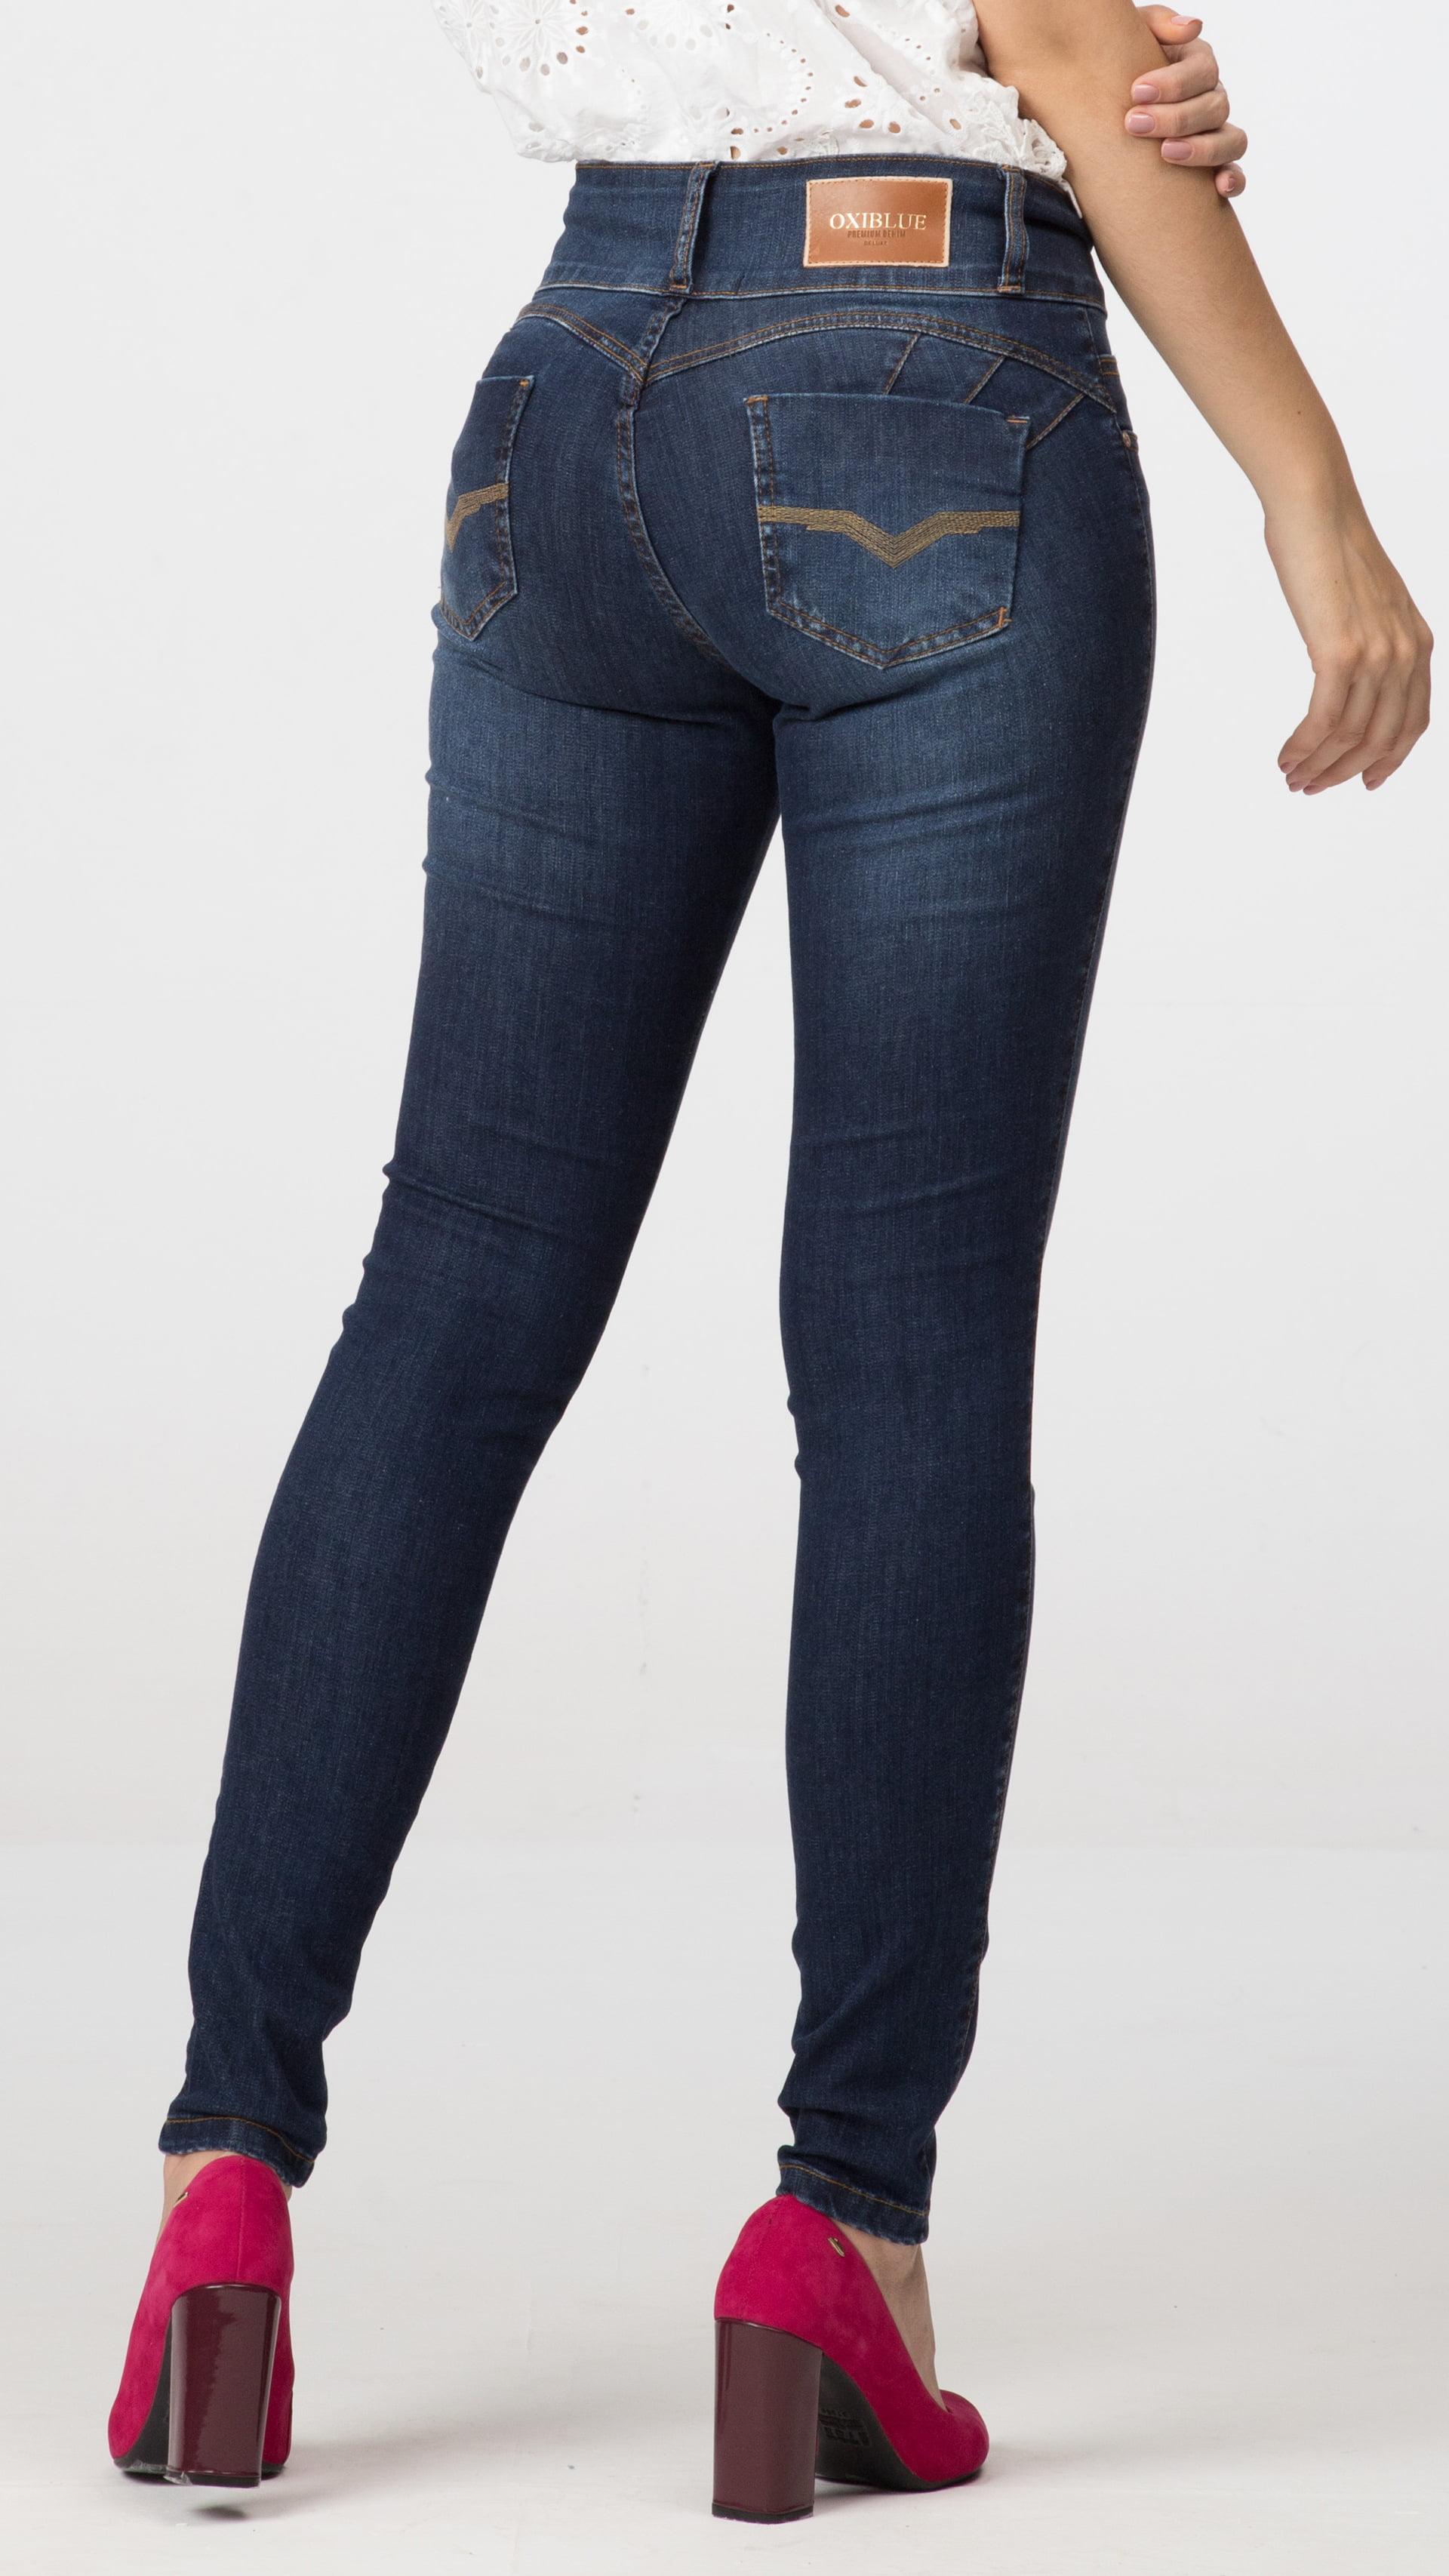 Calça Jeans Skinny Levanta Bumbum F2020303